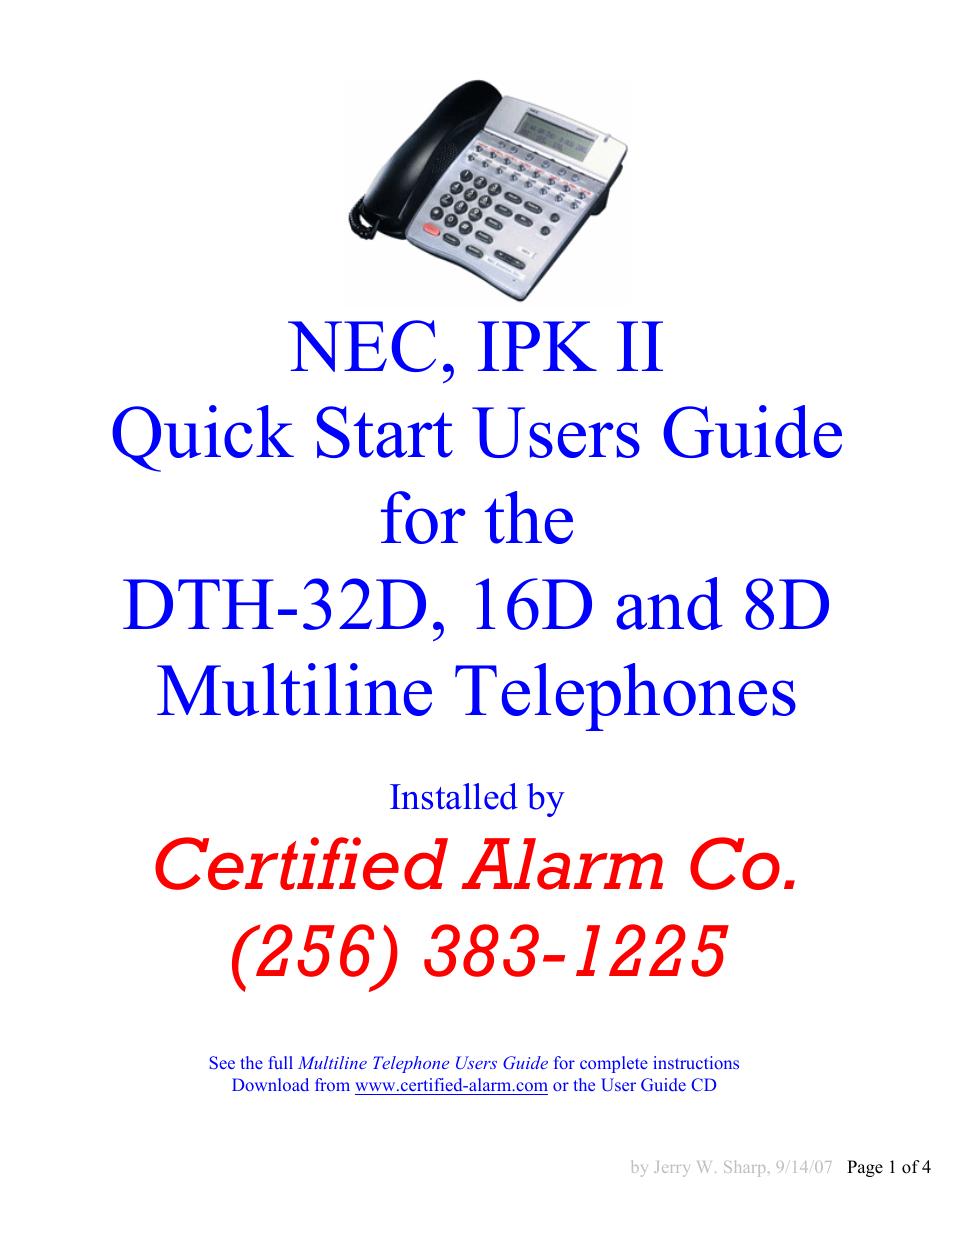 nec 16d and 8d user manual 4 pages rh manualsdir com